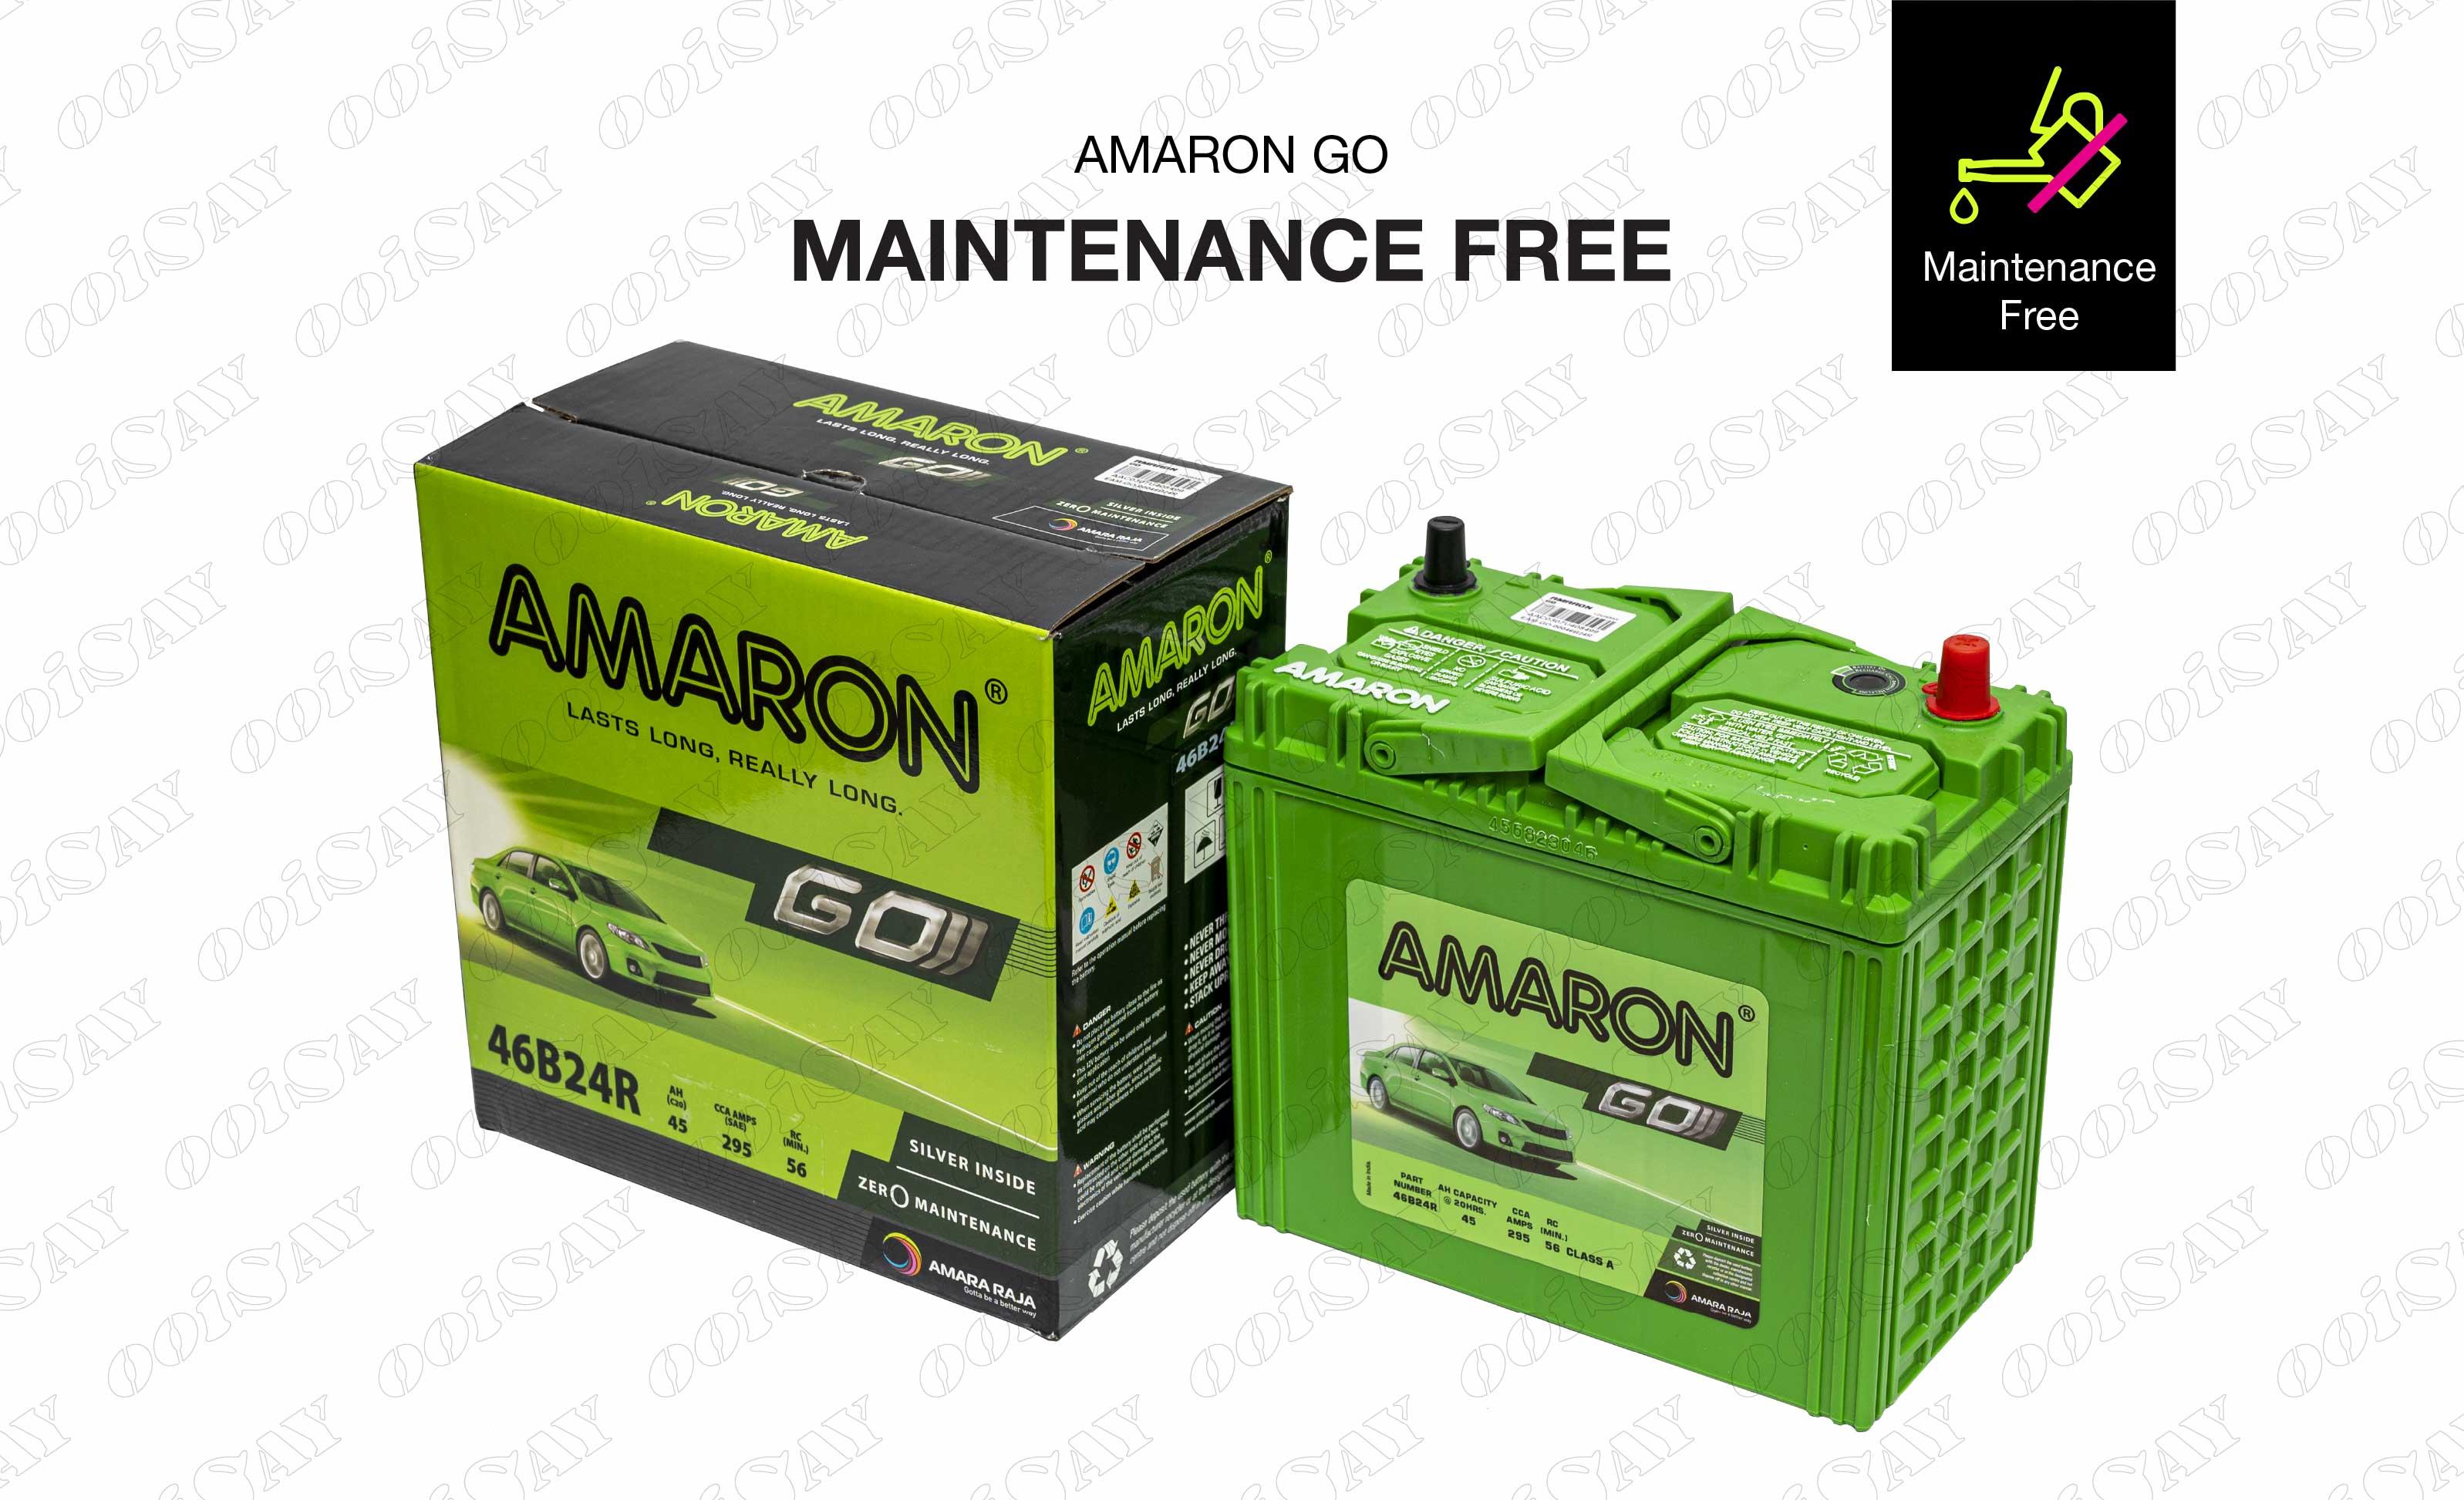 Amaron 46B24R Maintenance Free